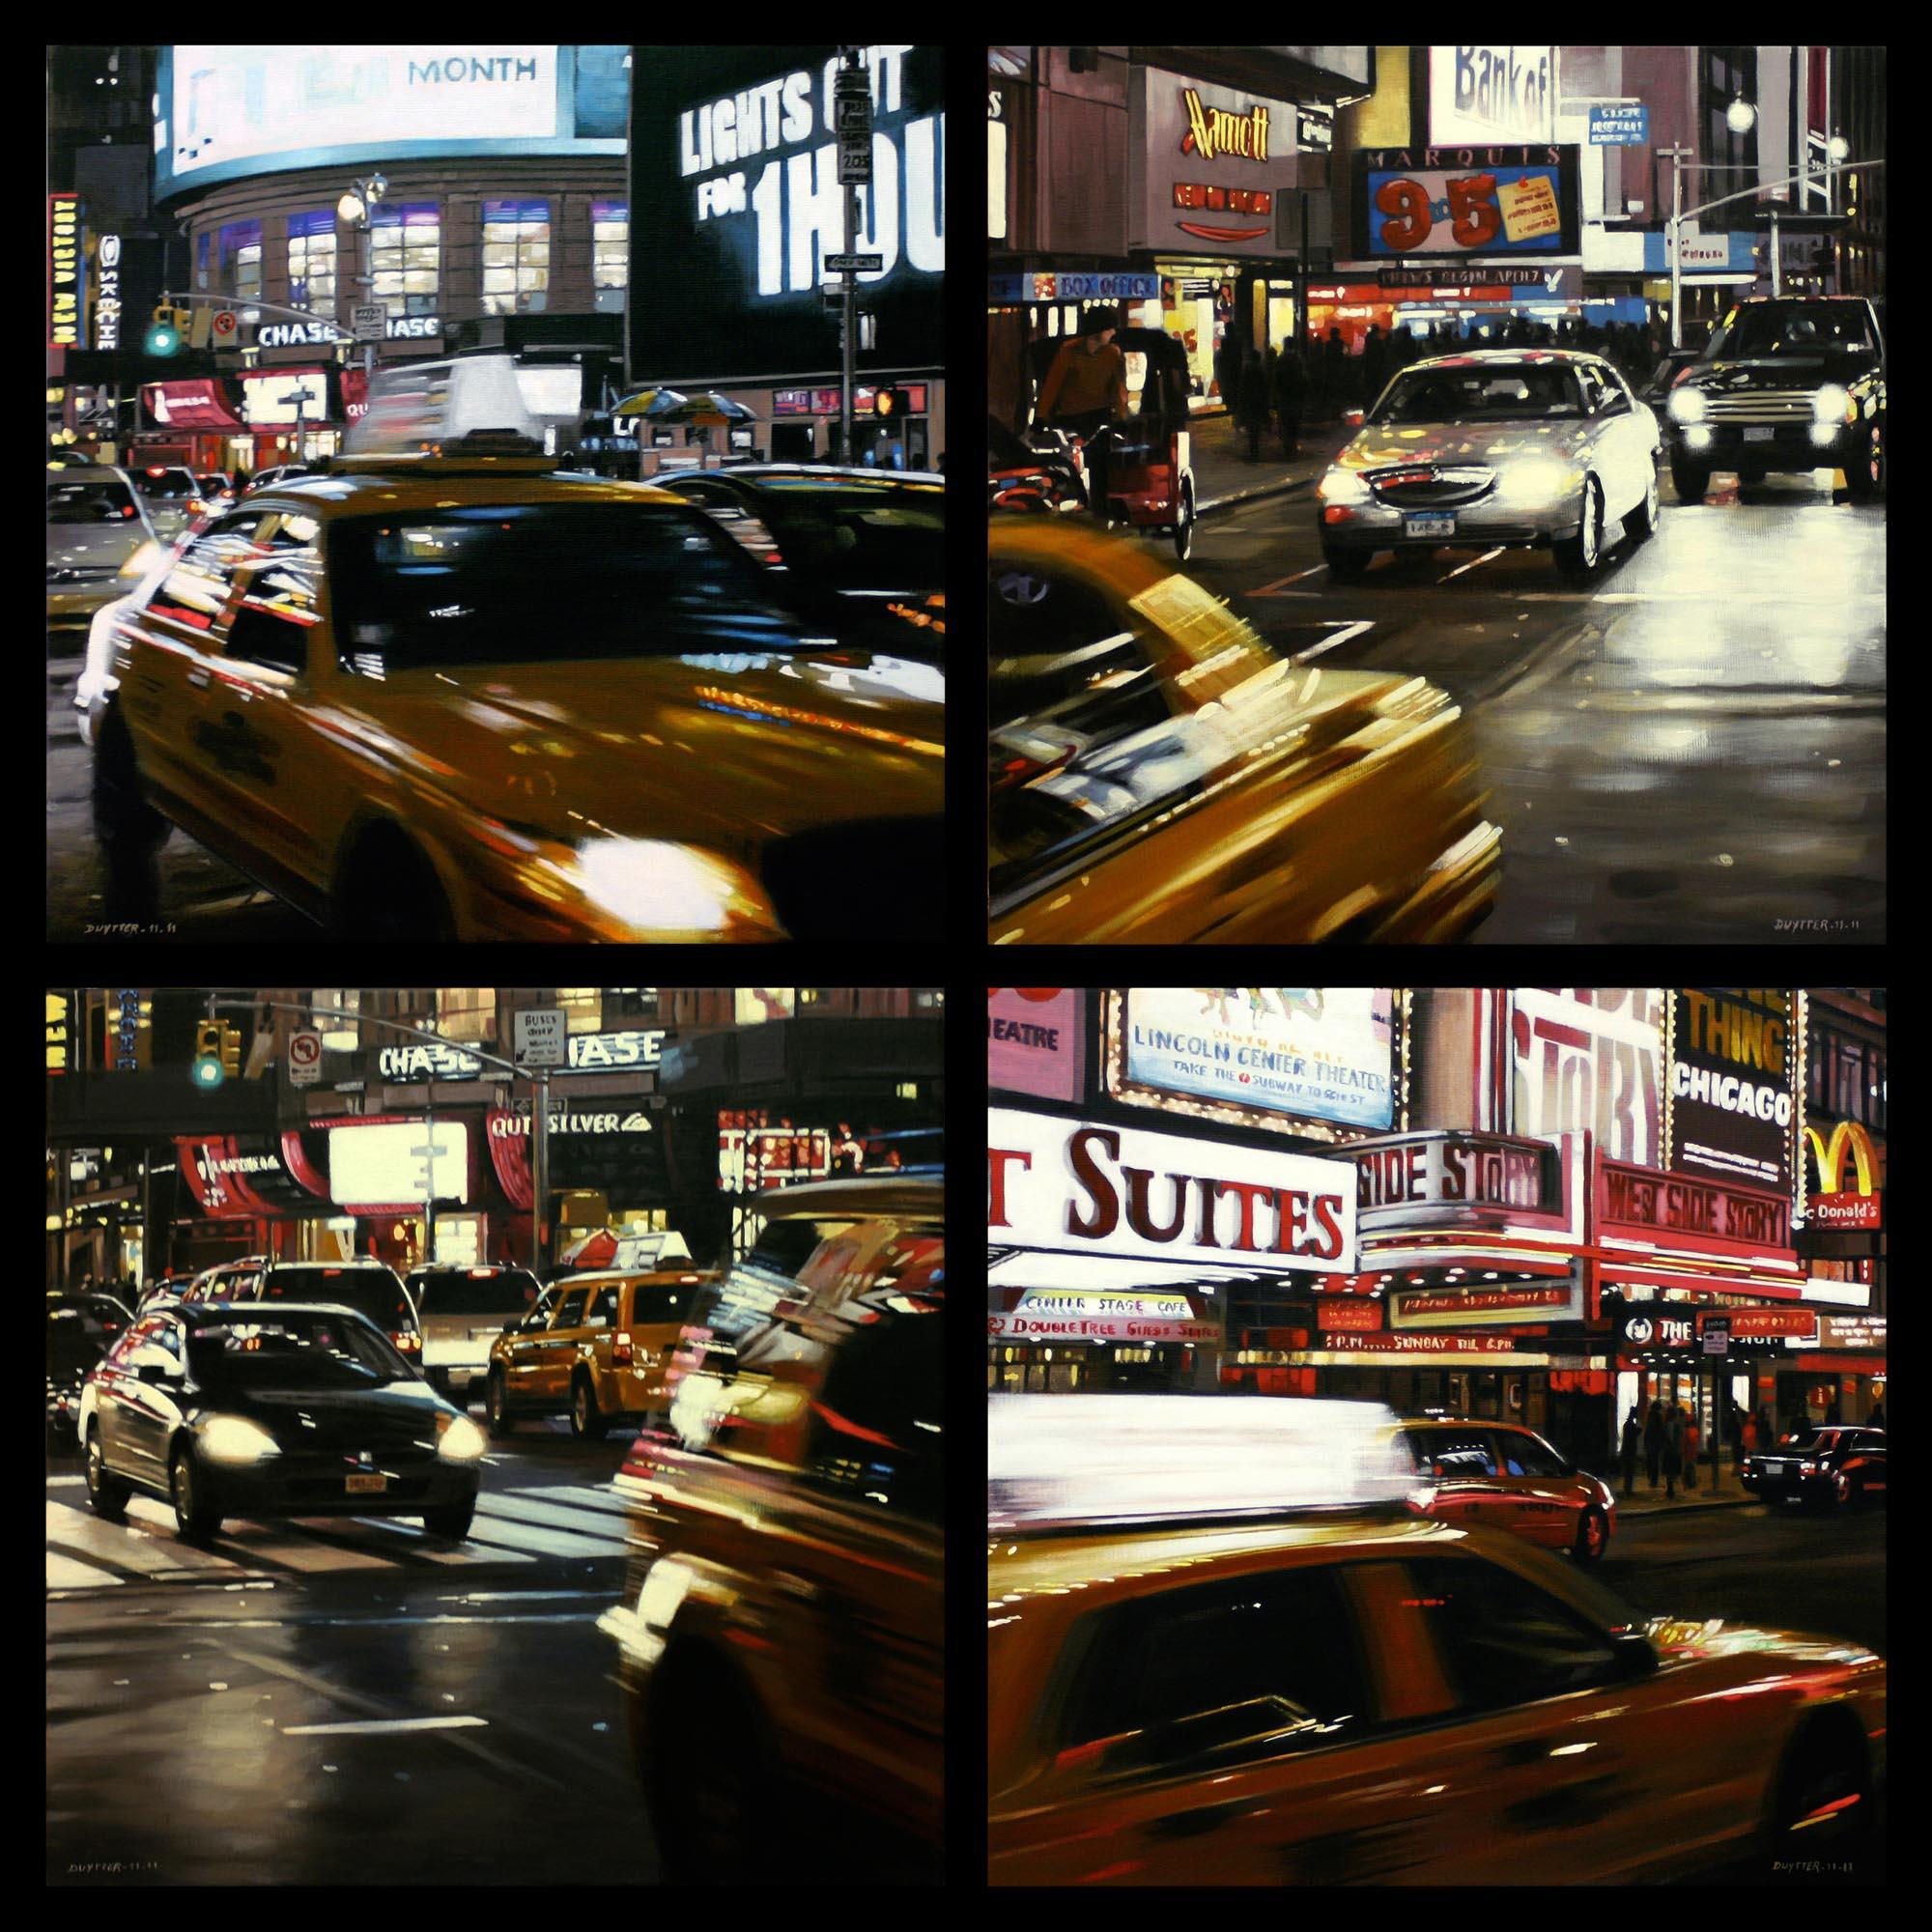 Speedy Time Square - Vendu